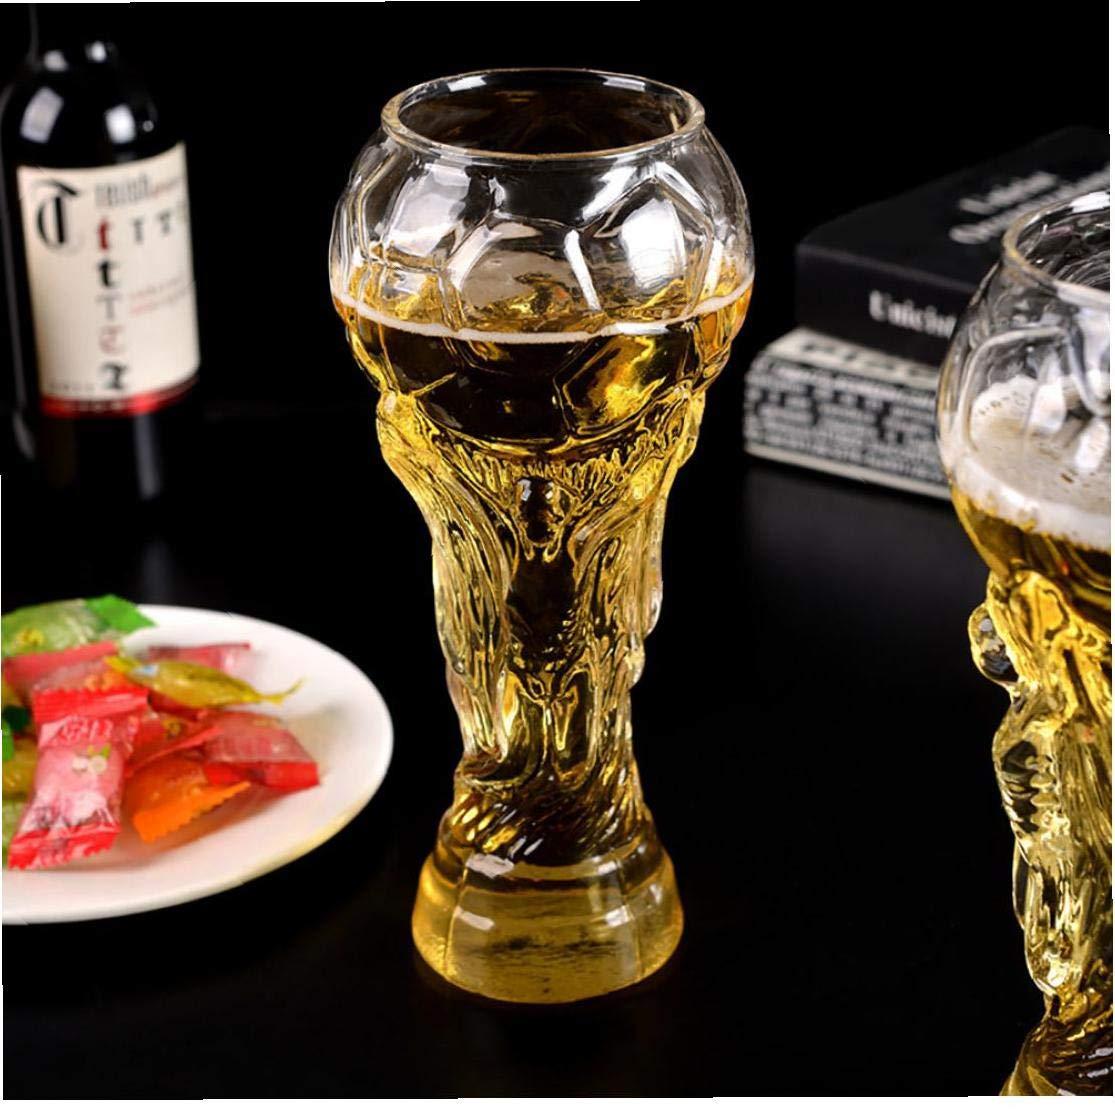 15.4OZ XKJFZ Cup Of Beer Mug Glass Mug 1PC Boots Unique Design Creative Design World Beer Decoration World Glass